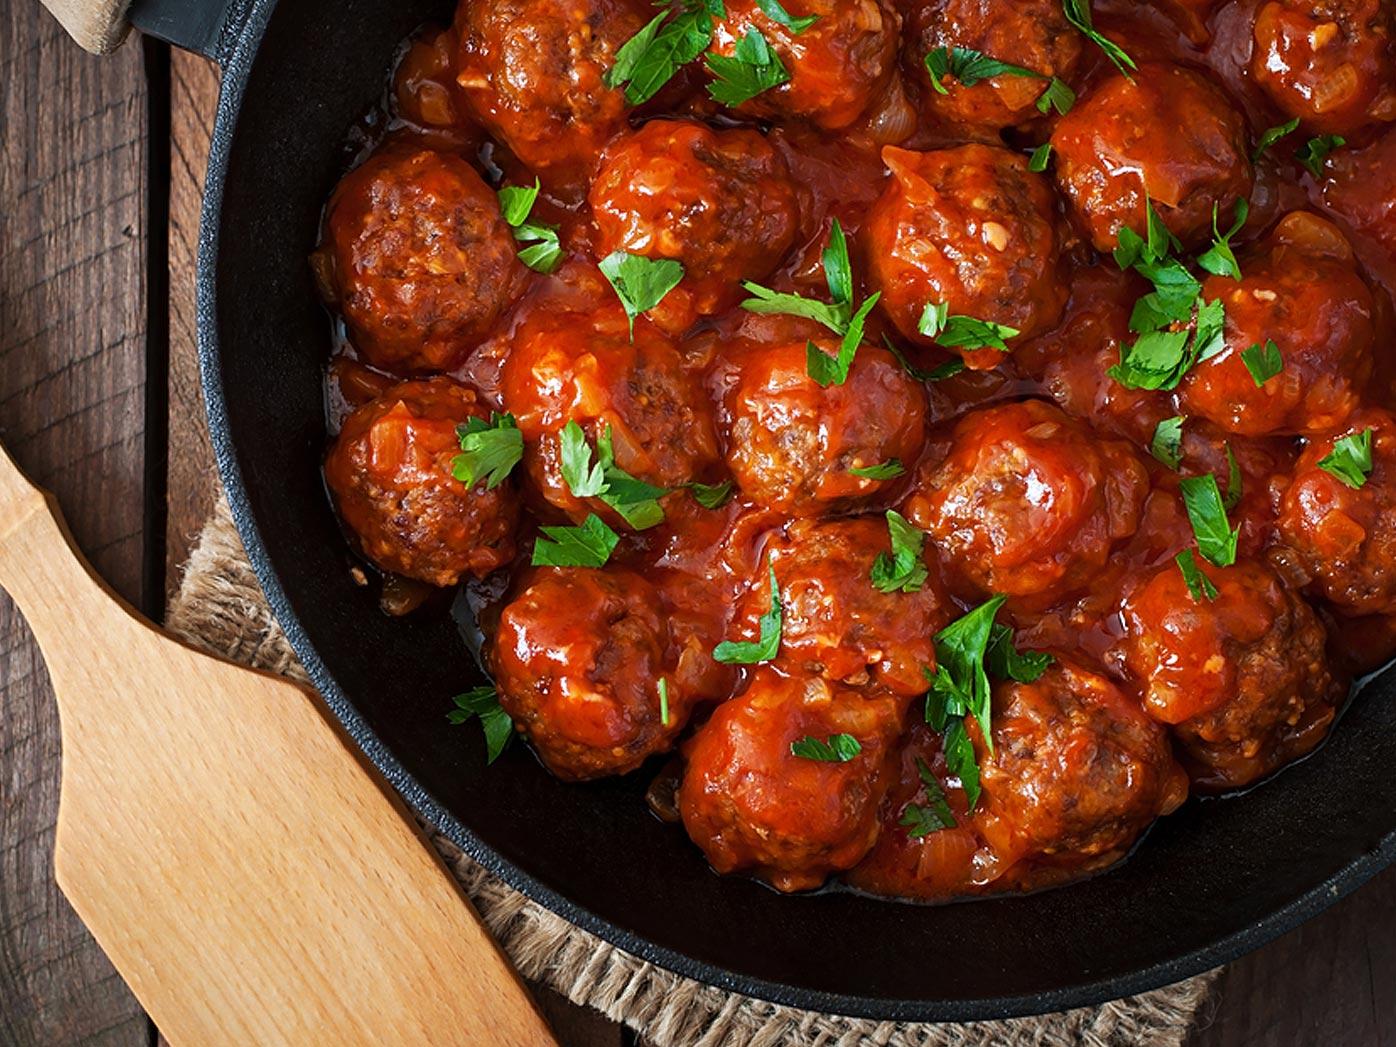 Barbecue Wagyu beef meatballs